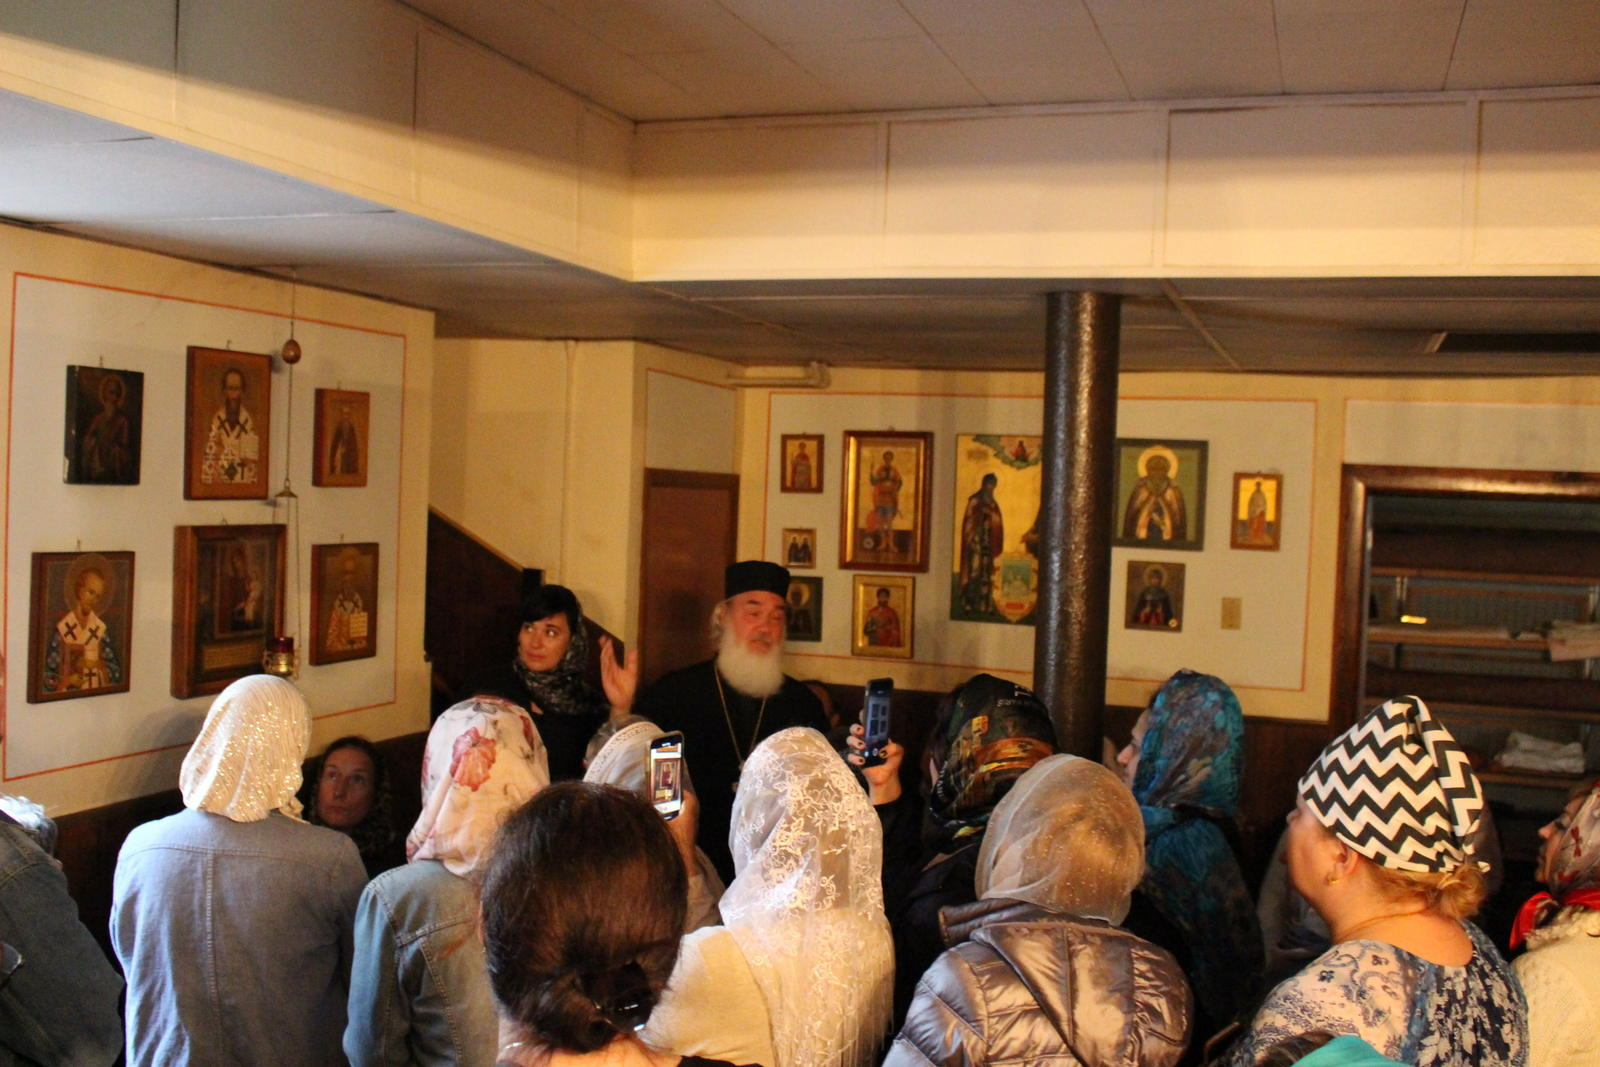 St-Trinity-monastery_02-Sept-2019_3-d-day_32